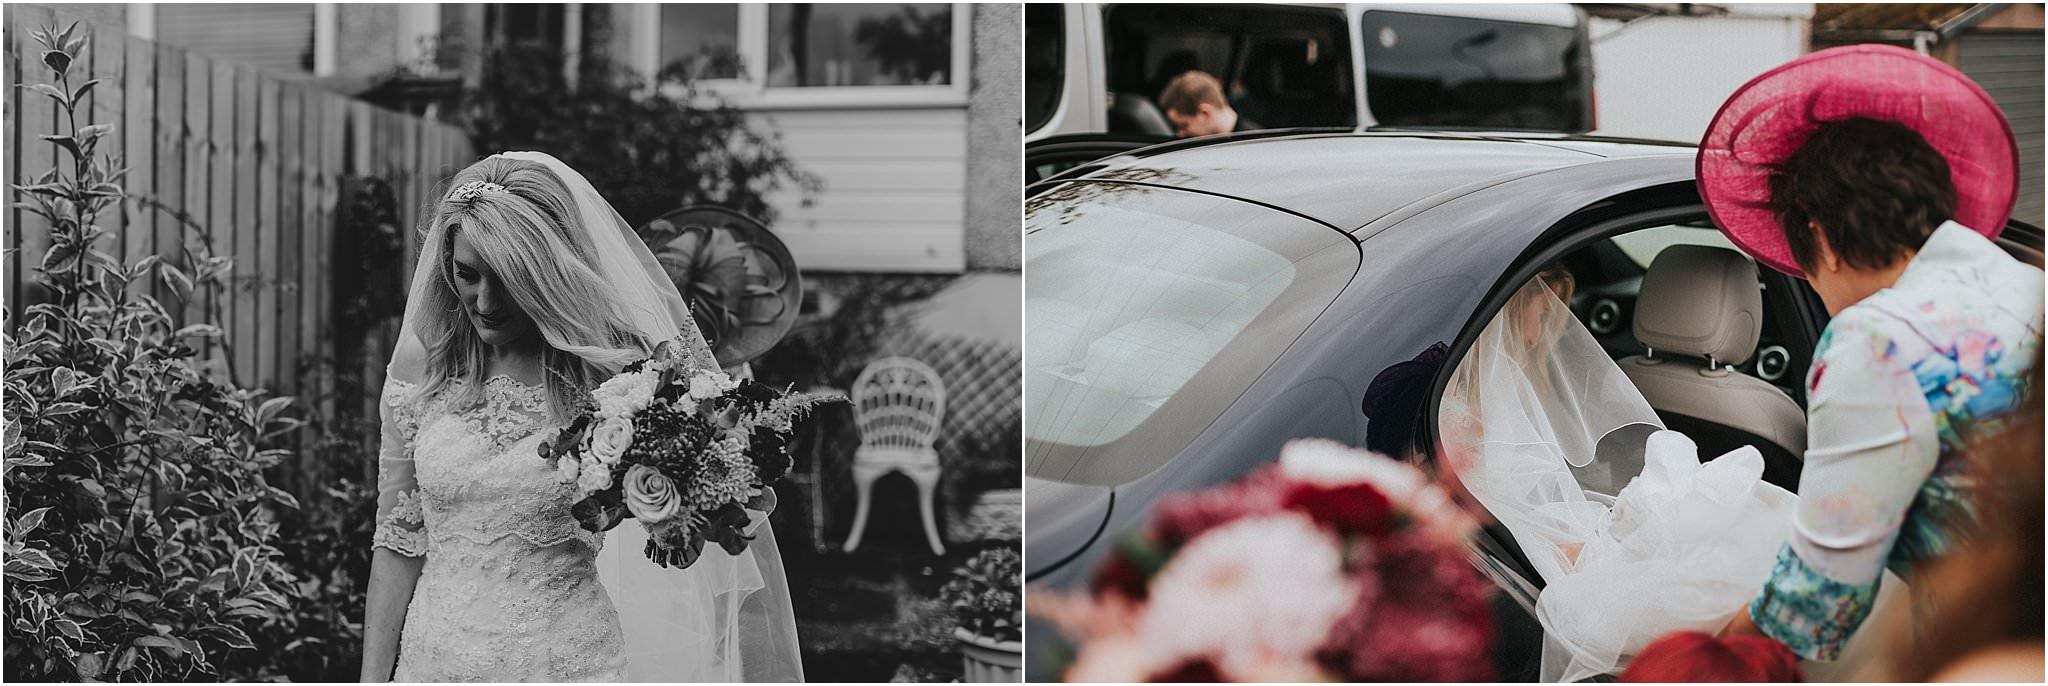 janie-garry-wedding12.jpg